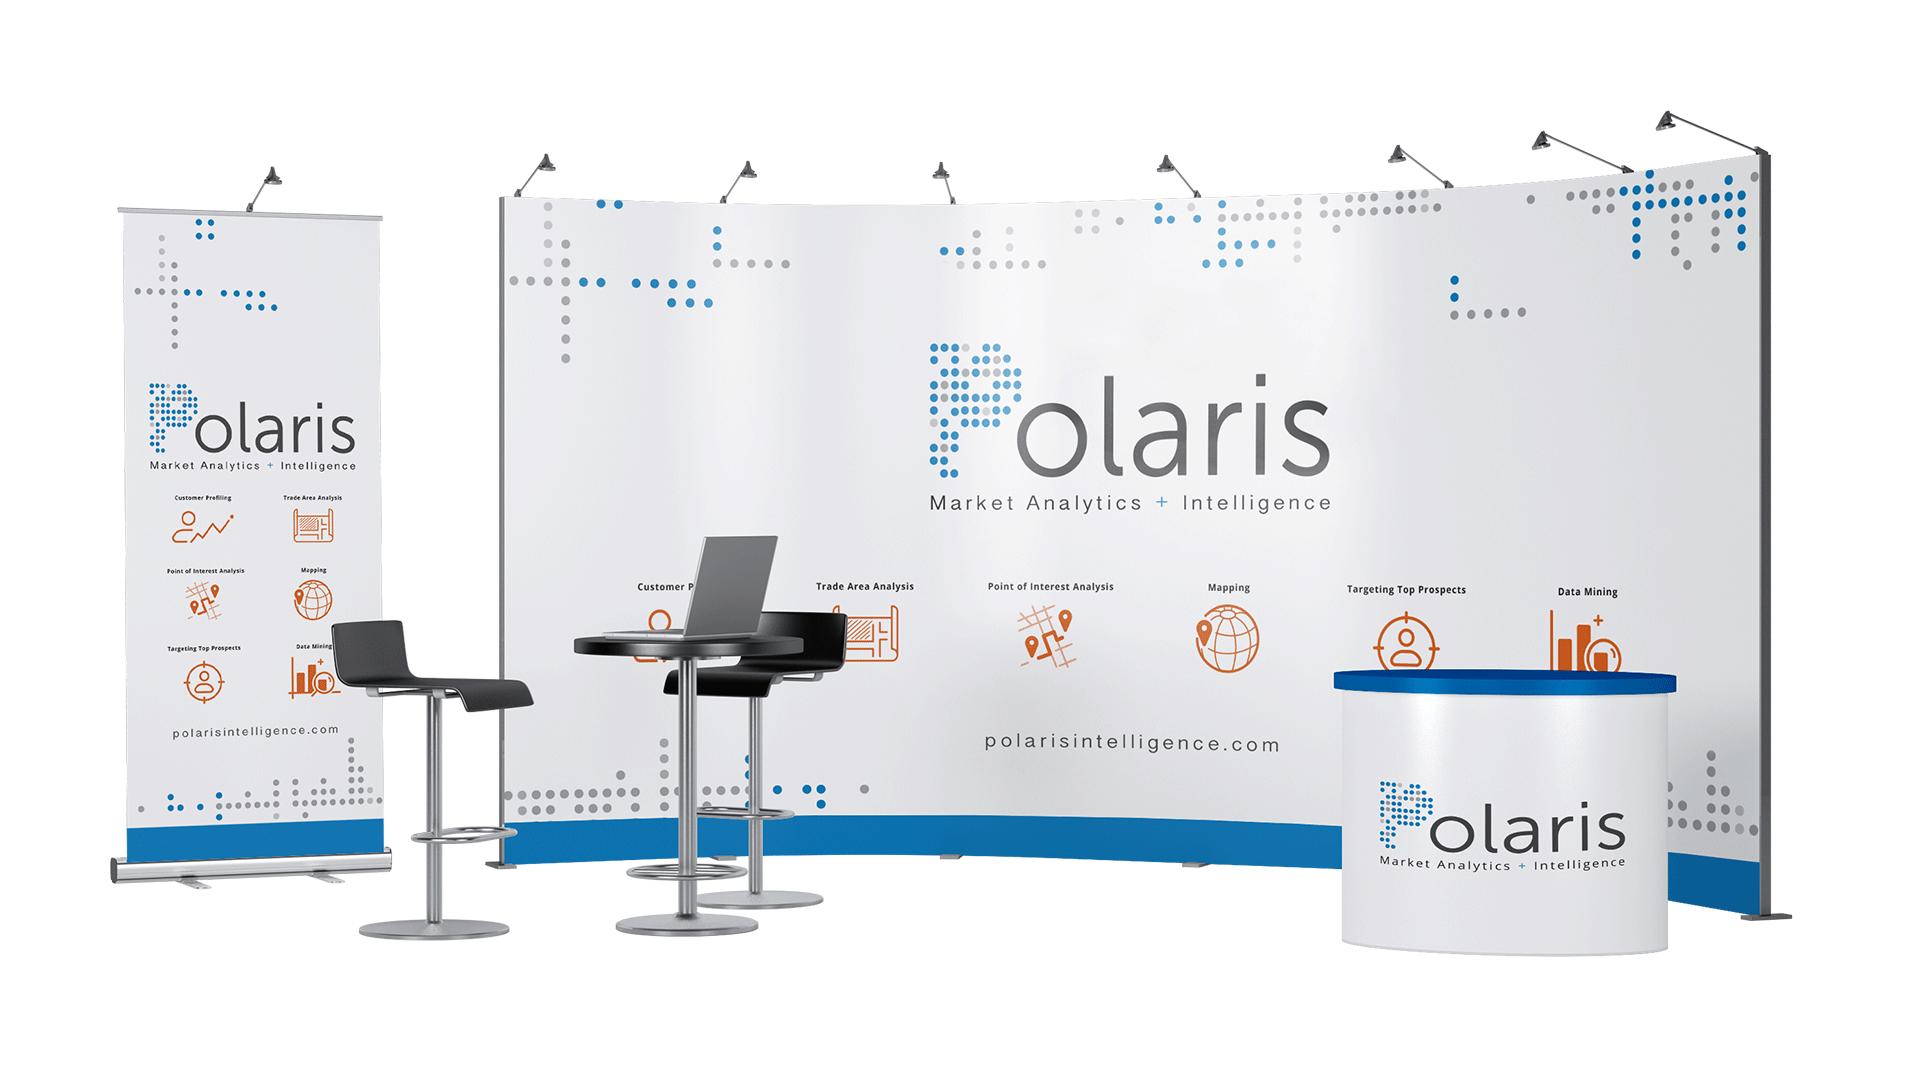 11-polaris-brand